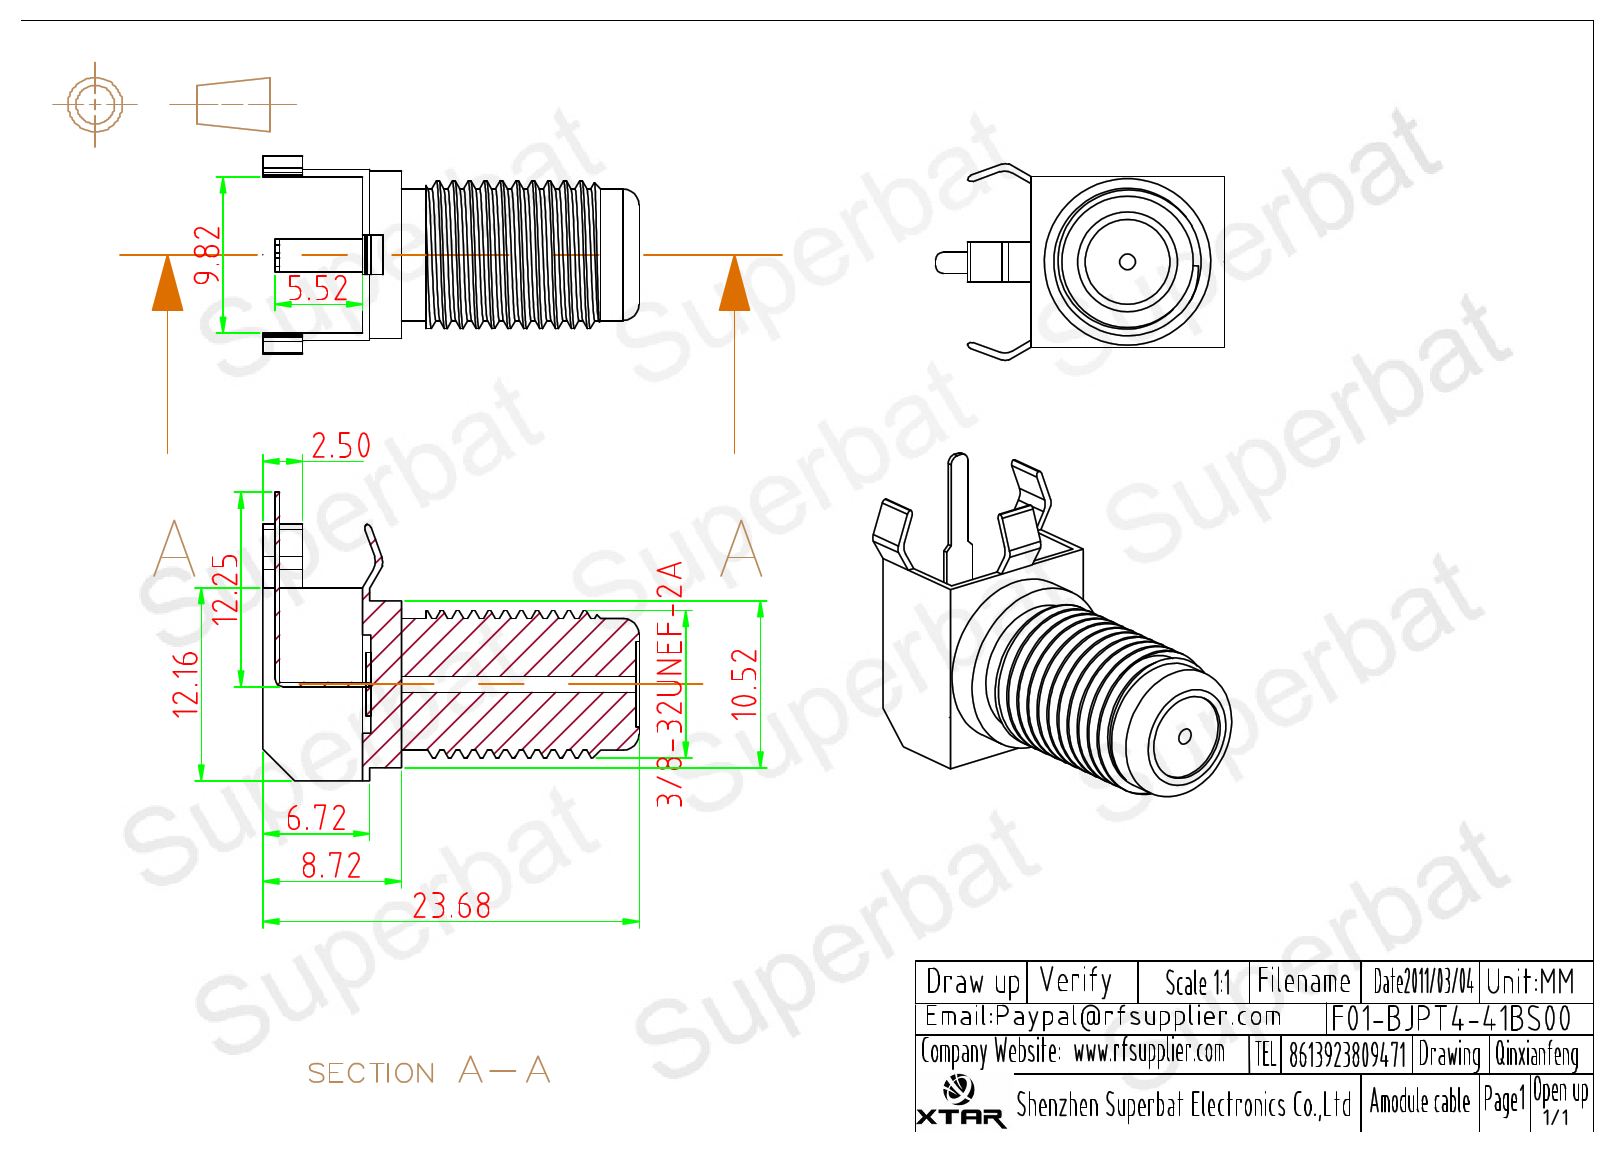 F01-BJPT4-41BS00 datasheet